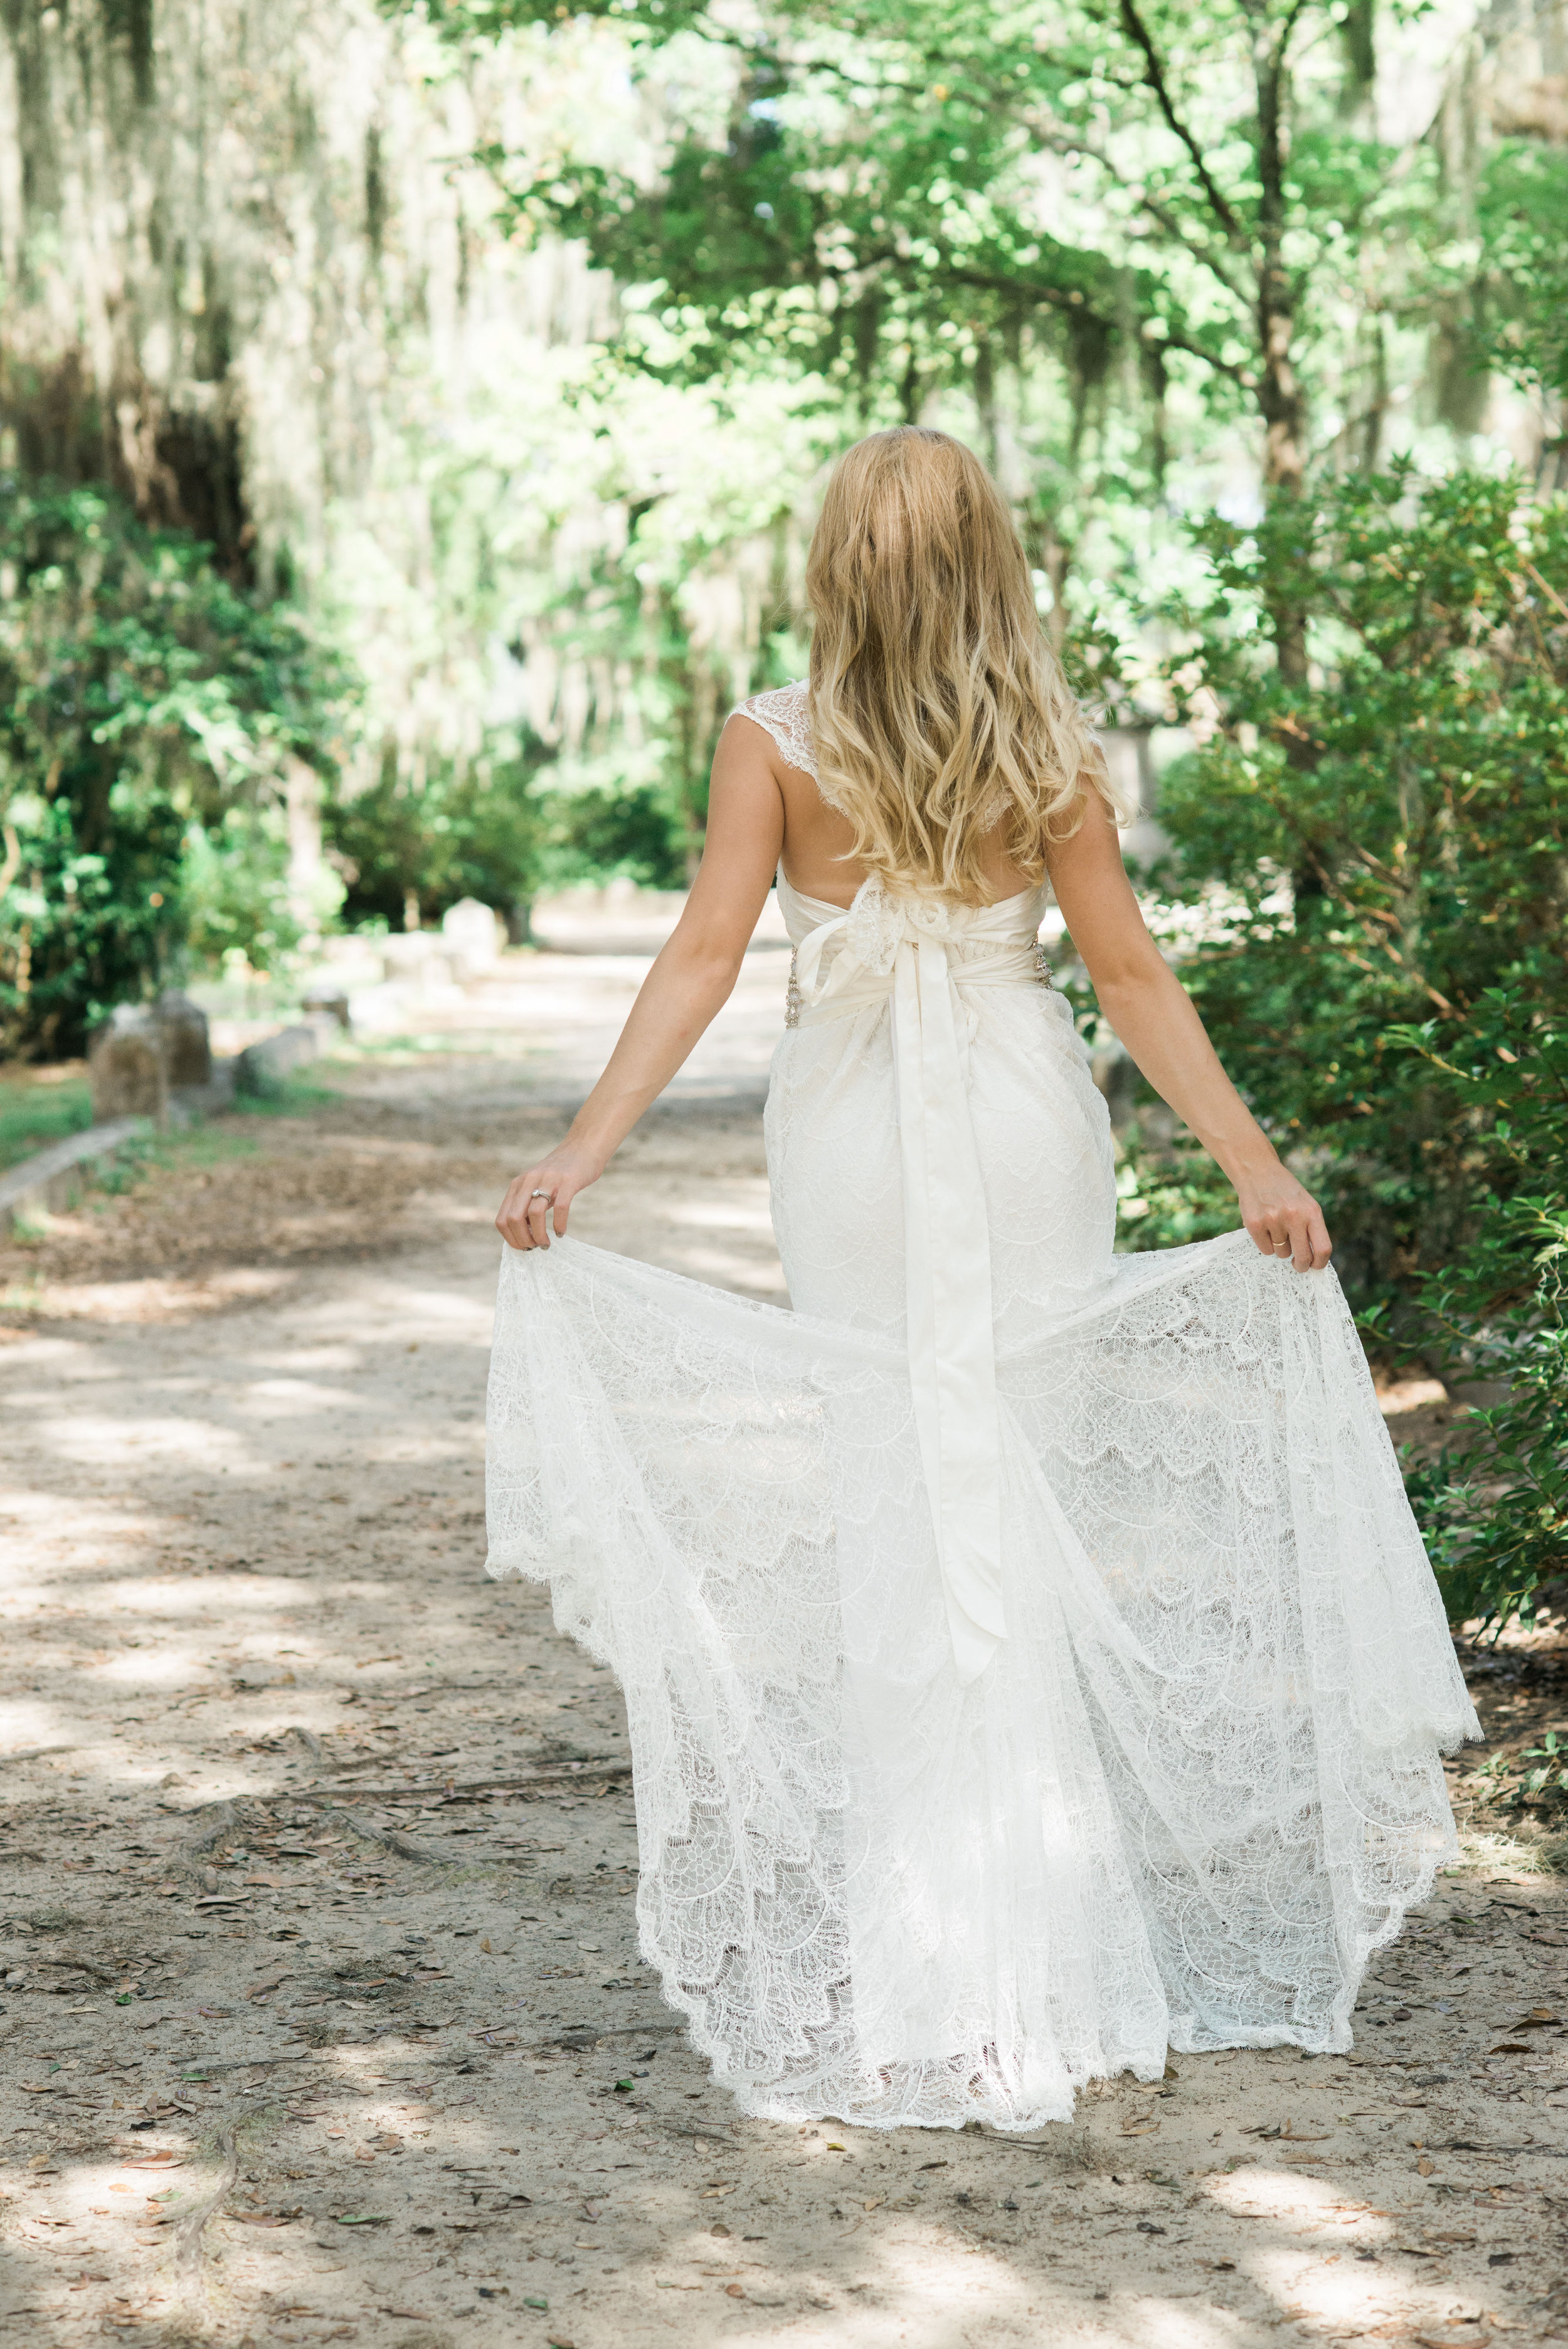 callie-beale-photography-Bonaventure-cemetery-michelle-royal-makeup-cemetery-wedding-ivory-and-beau-wedding-planning-anna-campbell-harper-savannah-bridal-boutique-savannah-wedding-dresses-savannah-weddings-20.jpg